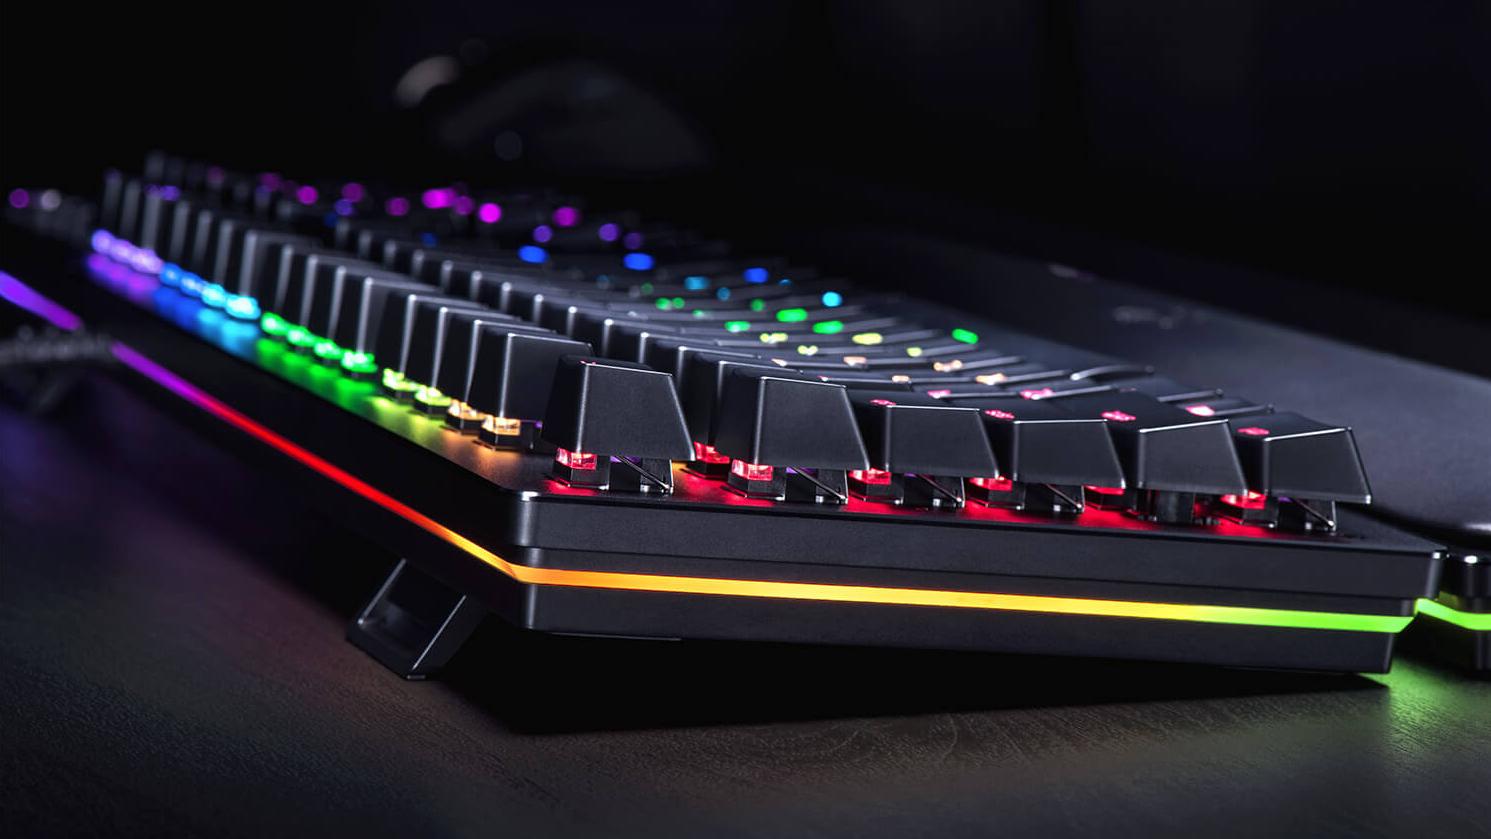 The Razer Huntsman Elite gaming keyboard is up to 23% cheaper